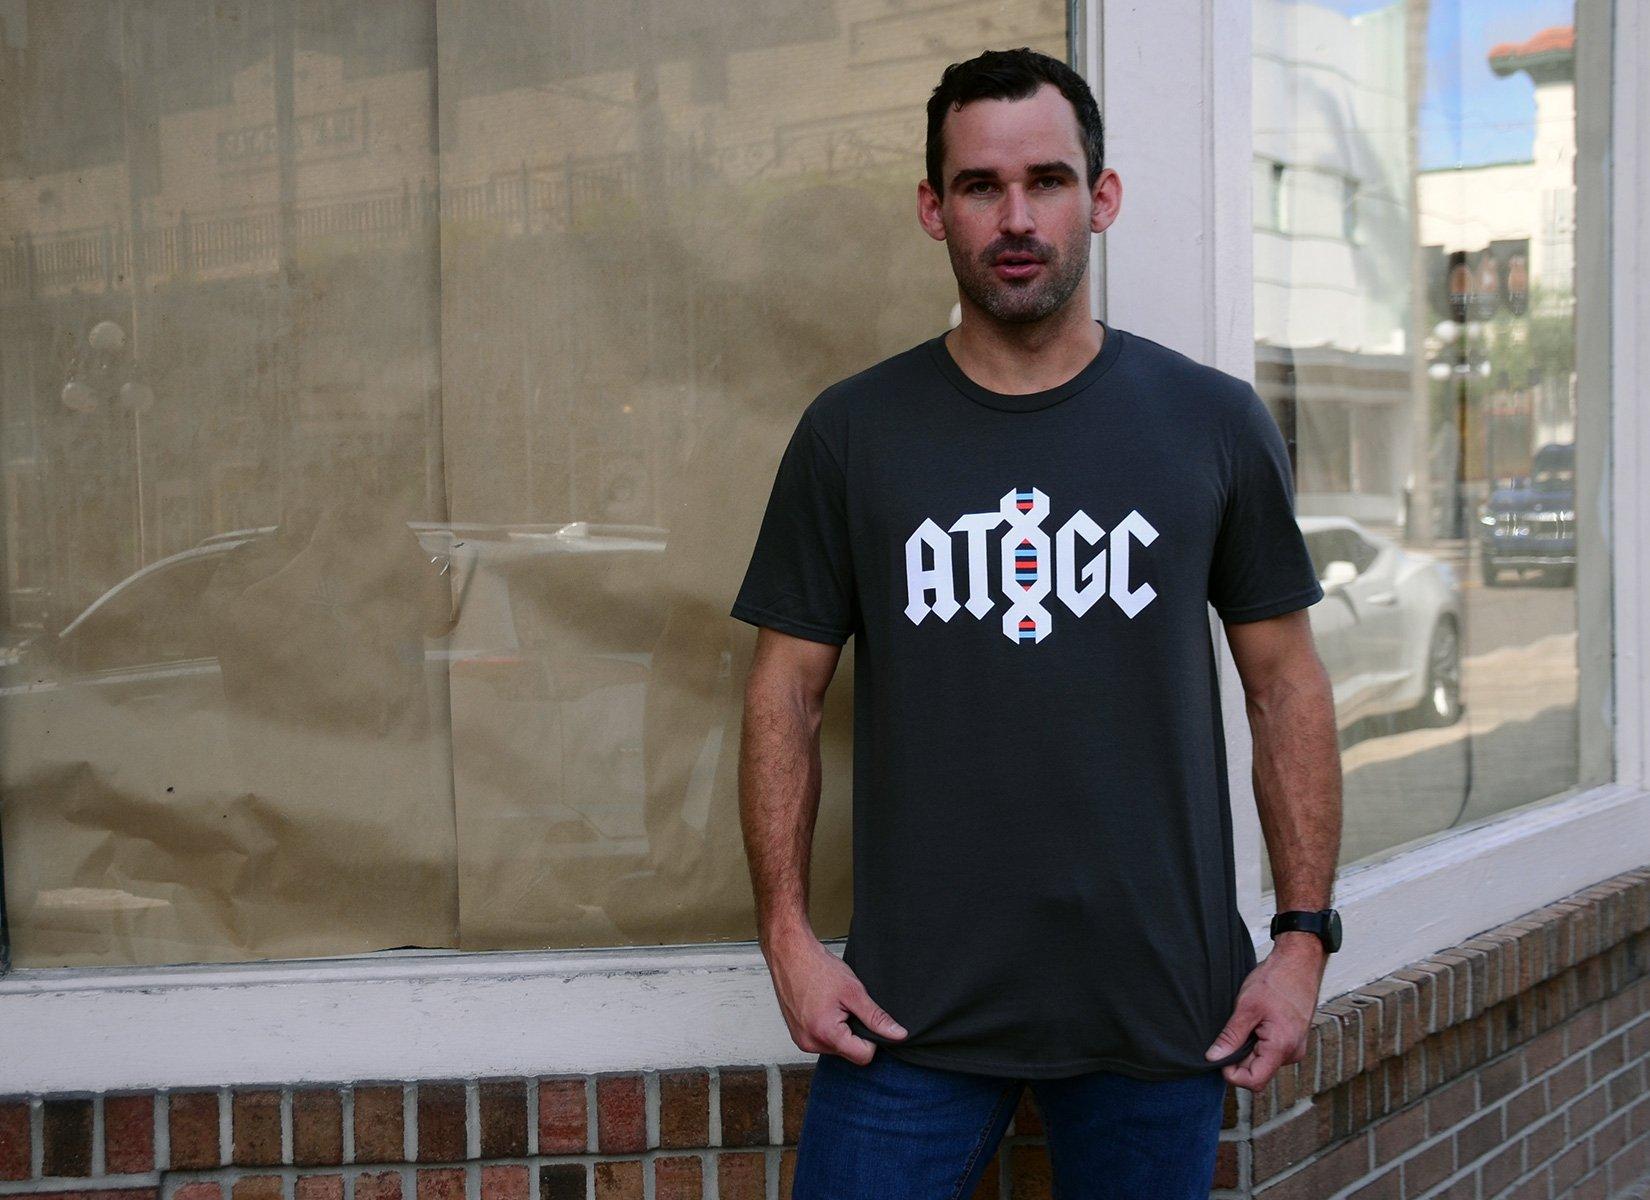 ATGC DNA on Mens T-Shirt